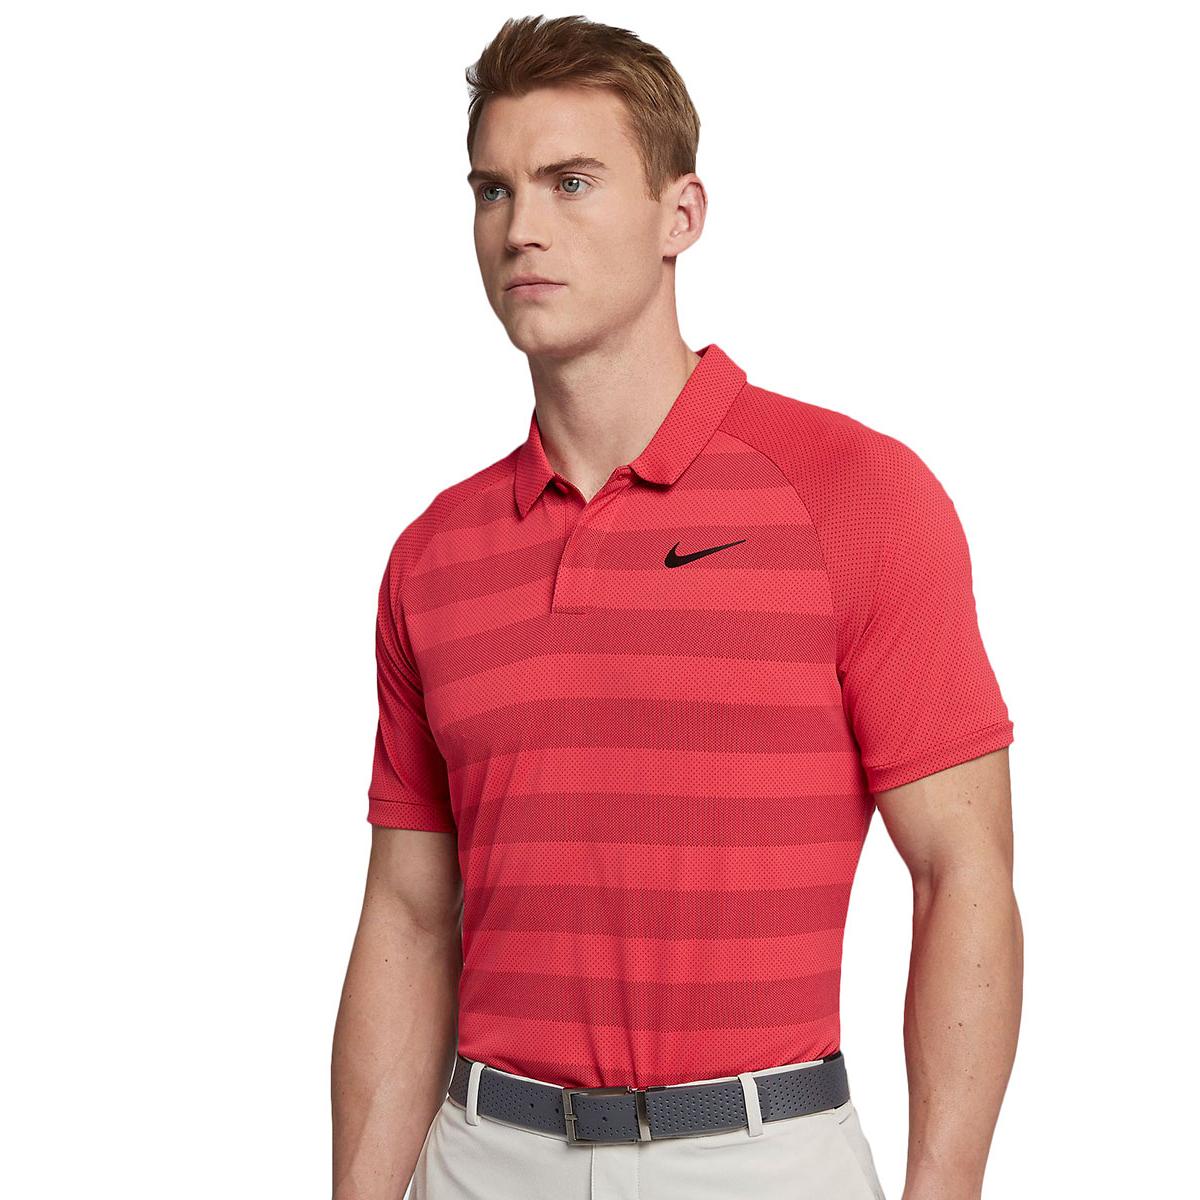 518849f9 Nike Golf Zonal Stripe Polo Shirt | Online Golf